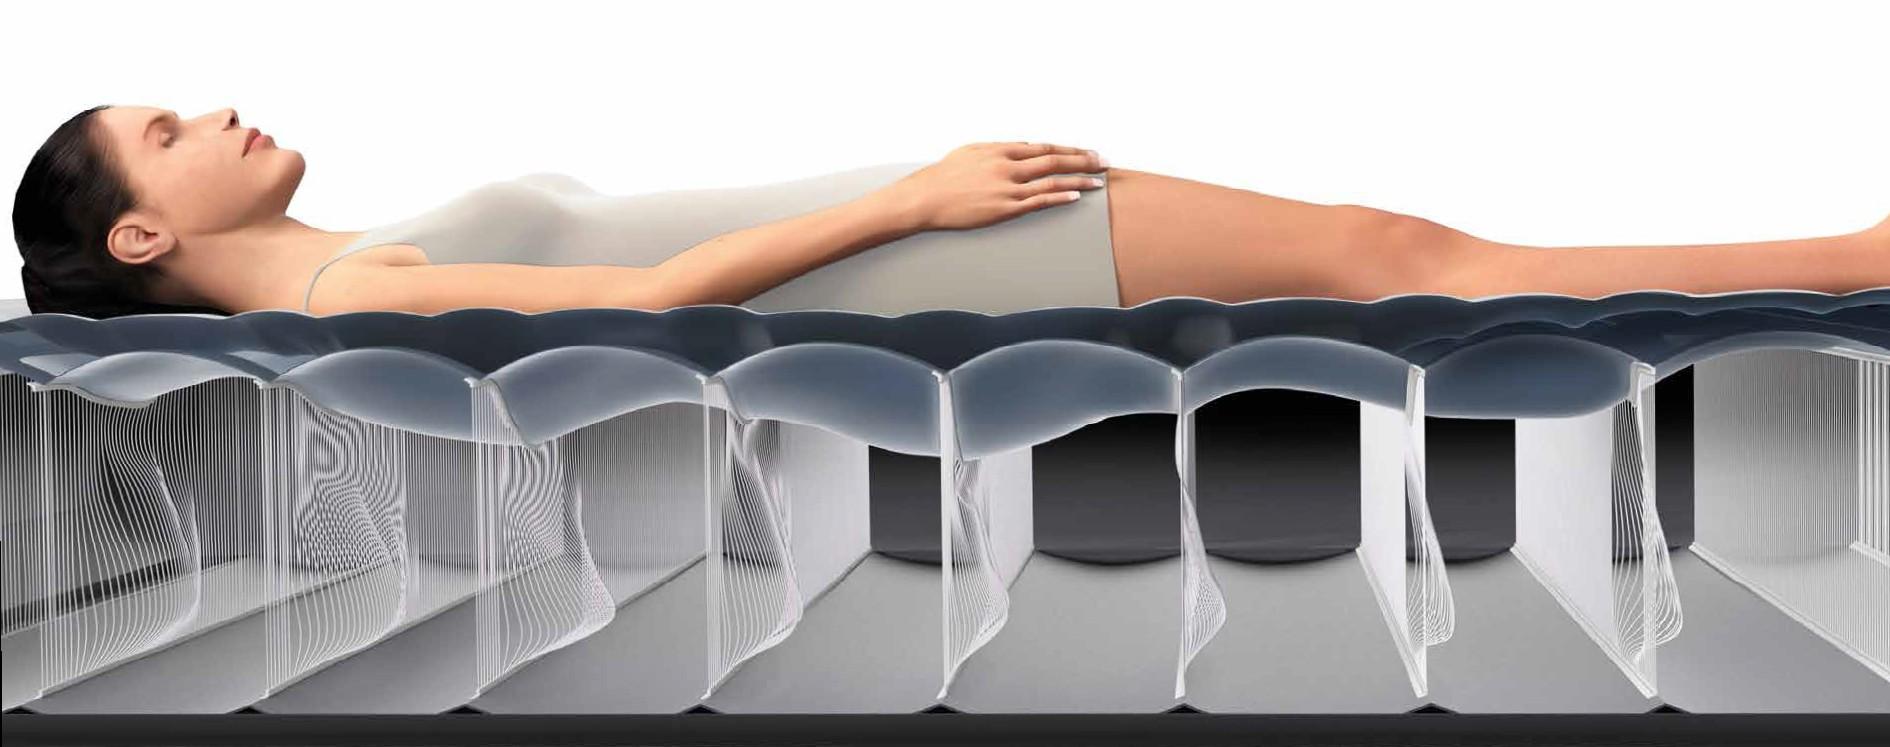 matelas gonflable lectrique deluxe rest bed 2 places fiber tech 152x203x42 ebay. Black Bedroom Furniture Sets. Home Design Ideas